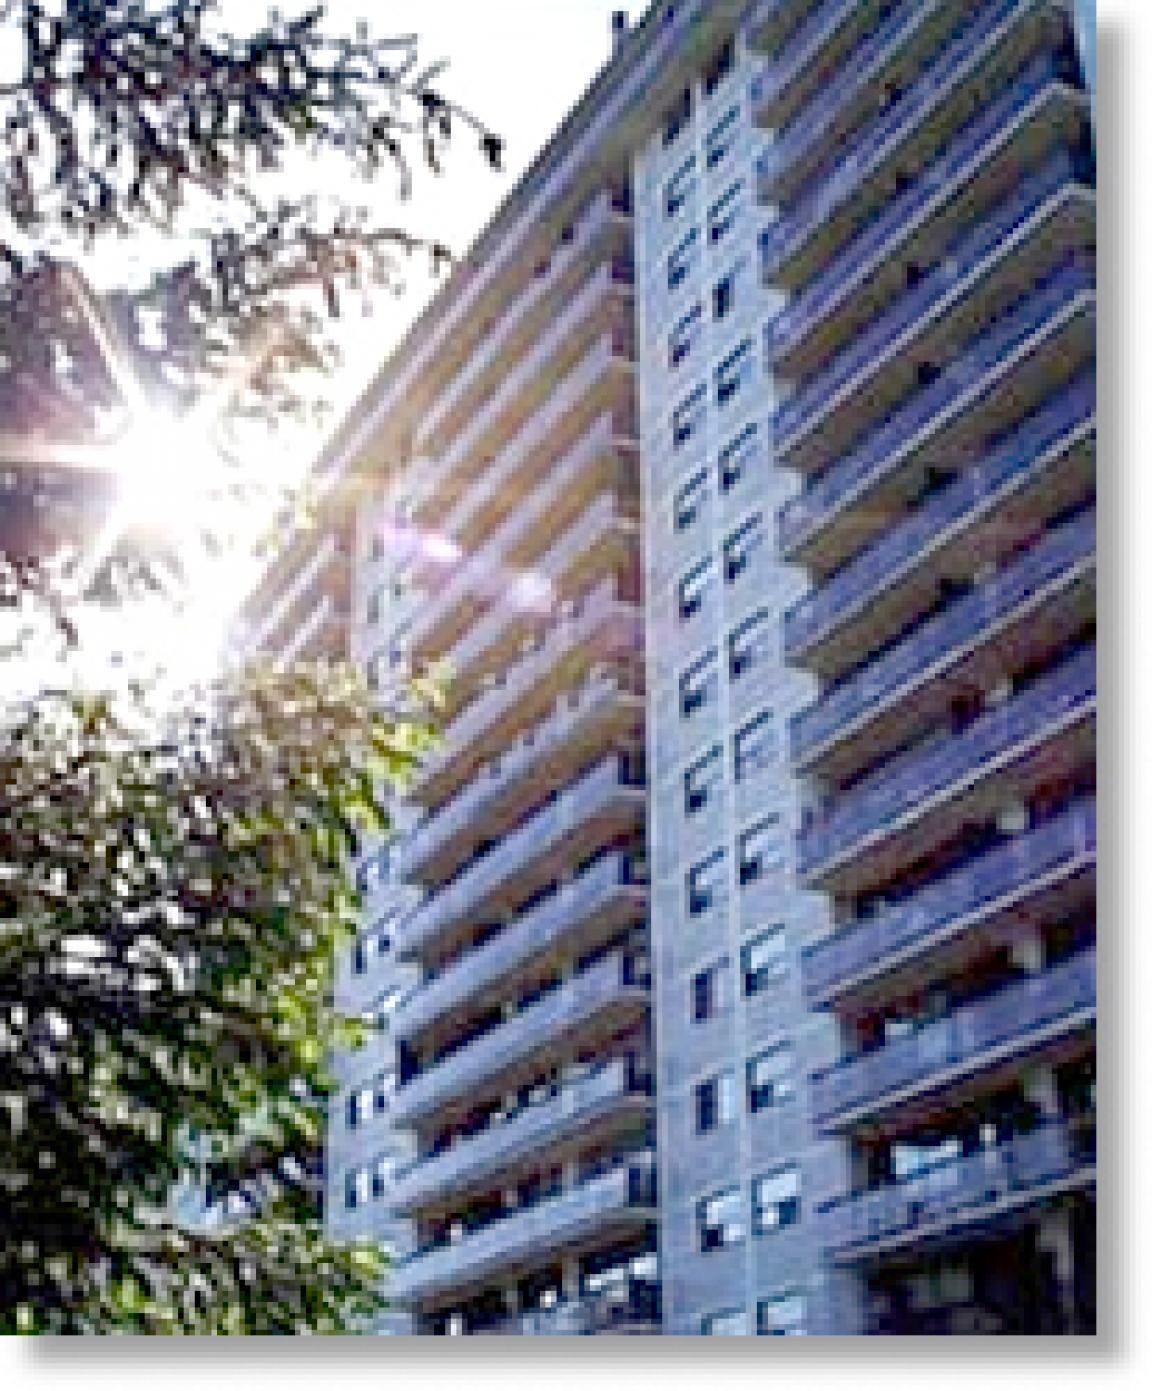 Apartment Building For Rent: 22 Oakmount Road, Toronto, Ontario M6R 2Z3